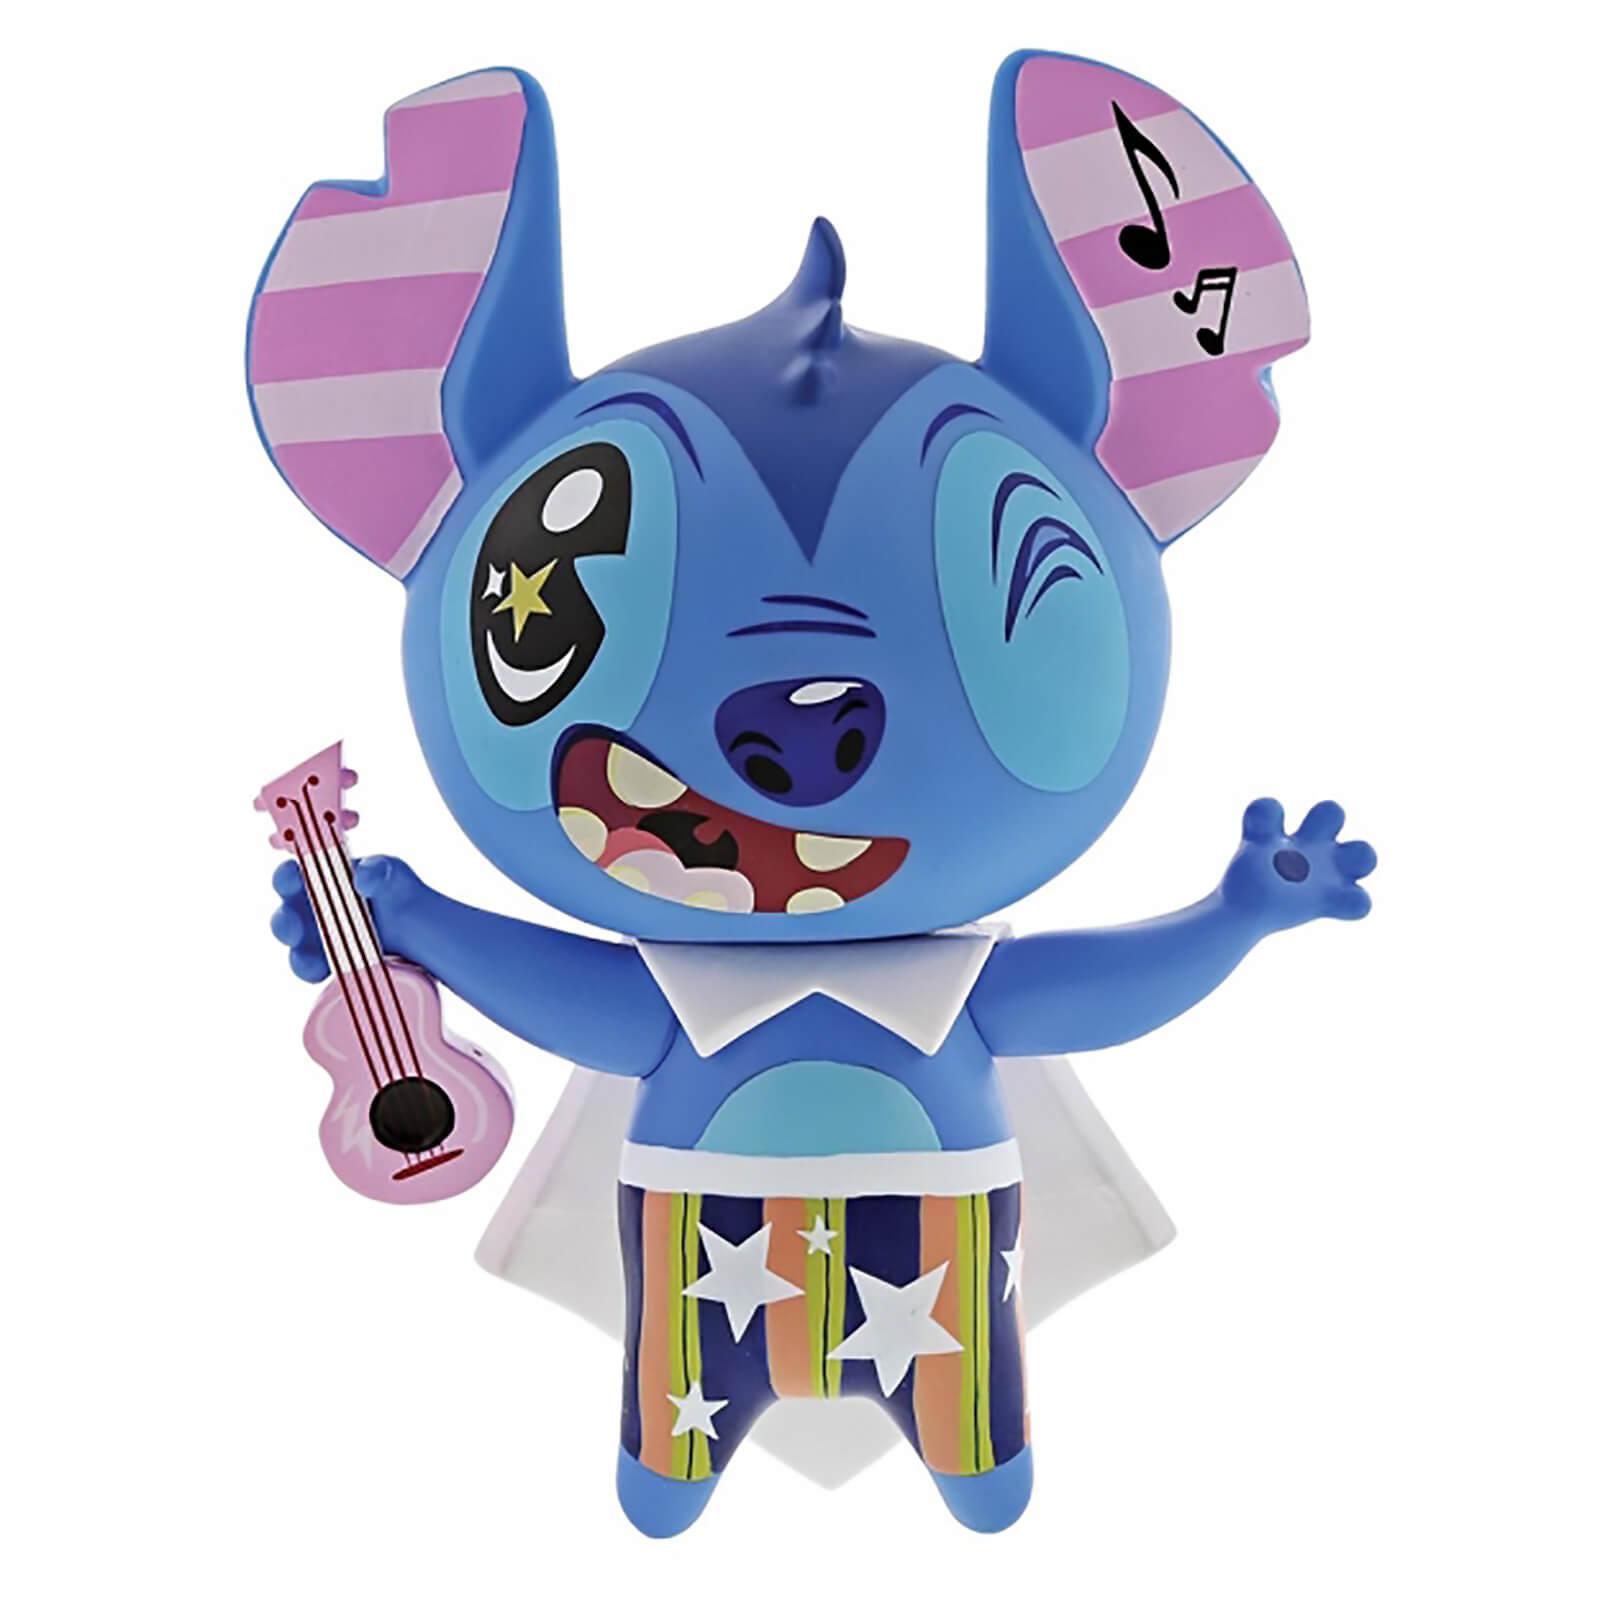 The World of Miss Mindy Presents Miss Mindy Stitch Figurine en vinyle